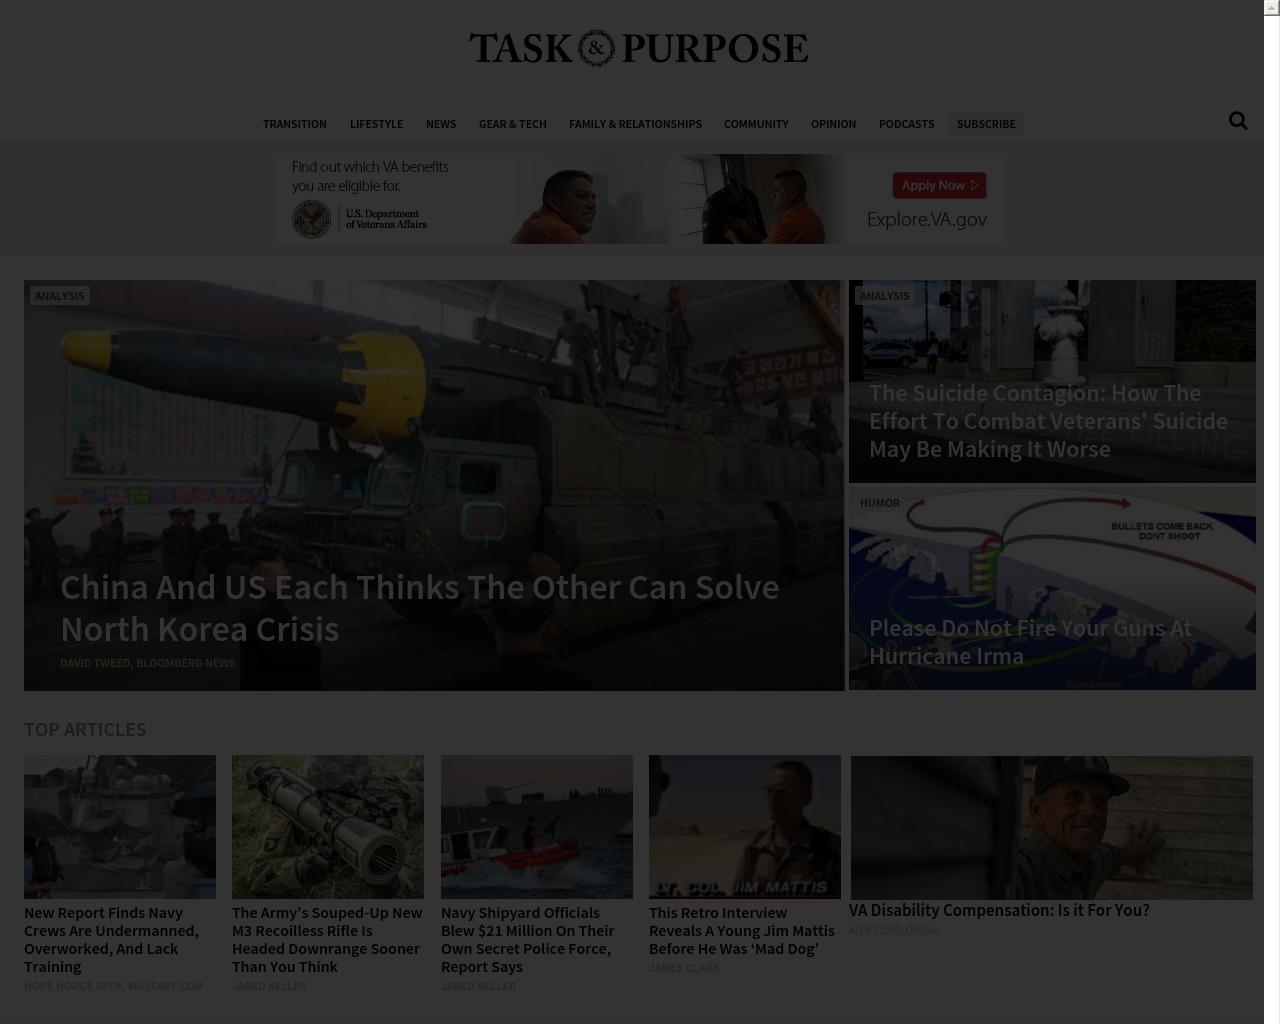 Task-&-Purpose-Advertising-Reviews-Pricing